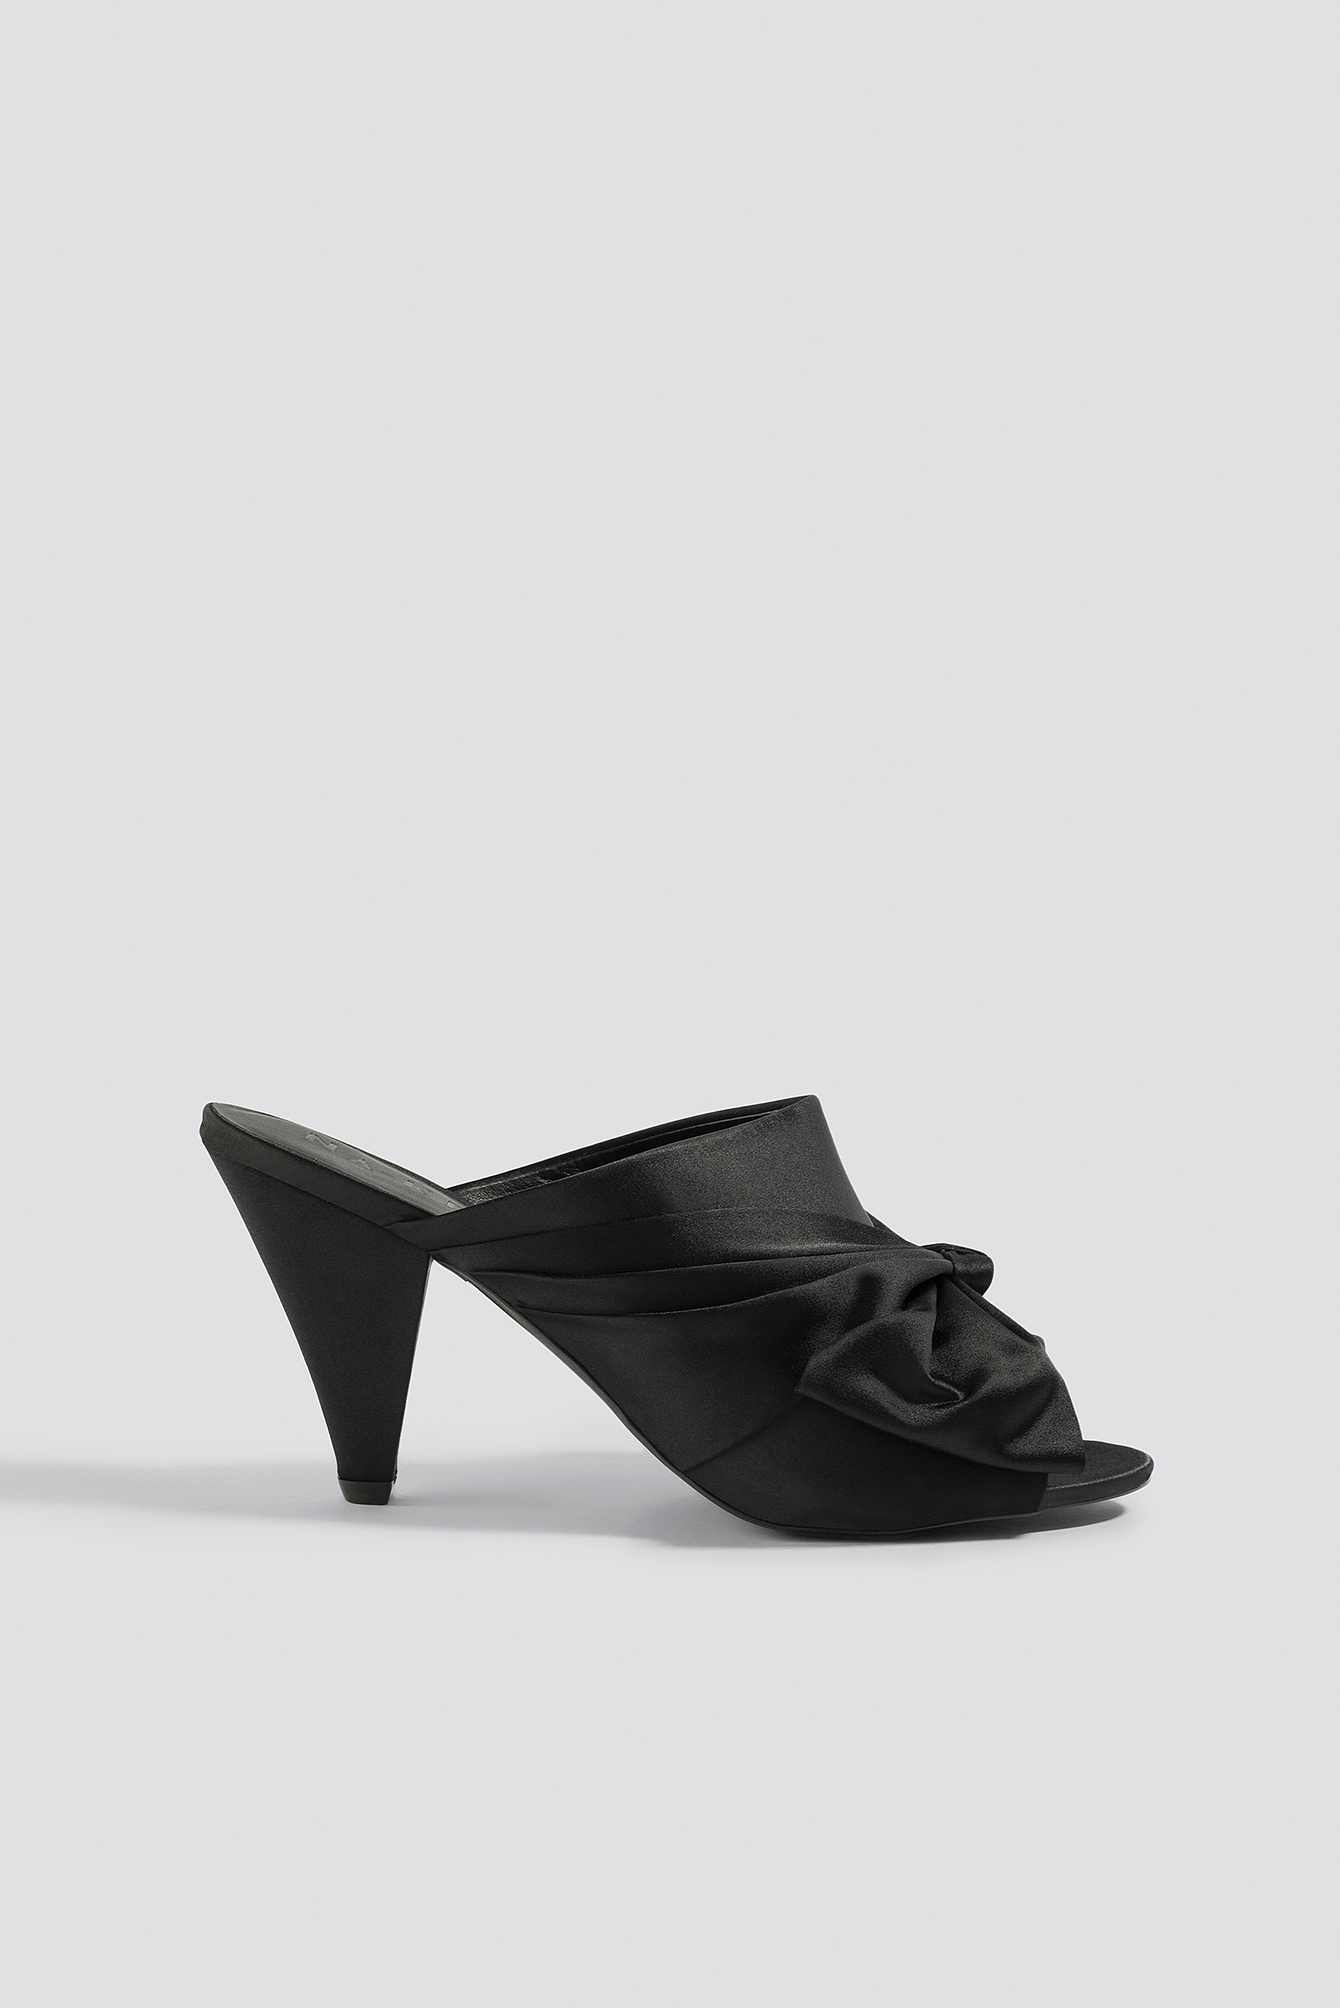 Bow Detail Mule Heels NA-KD.COM